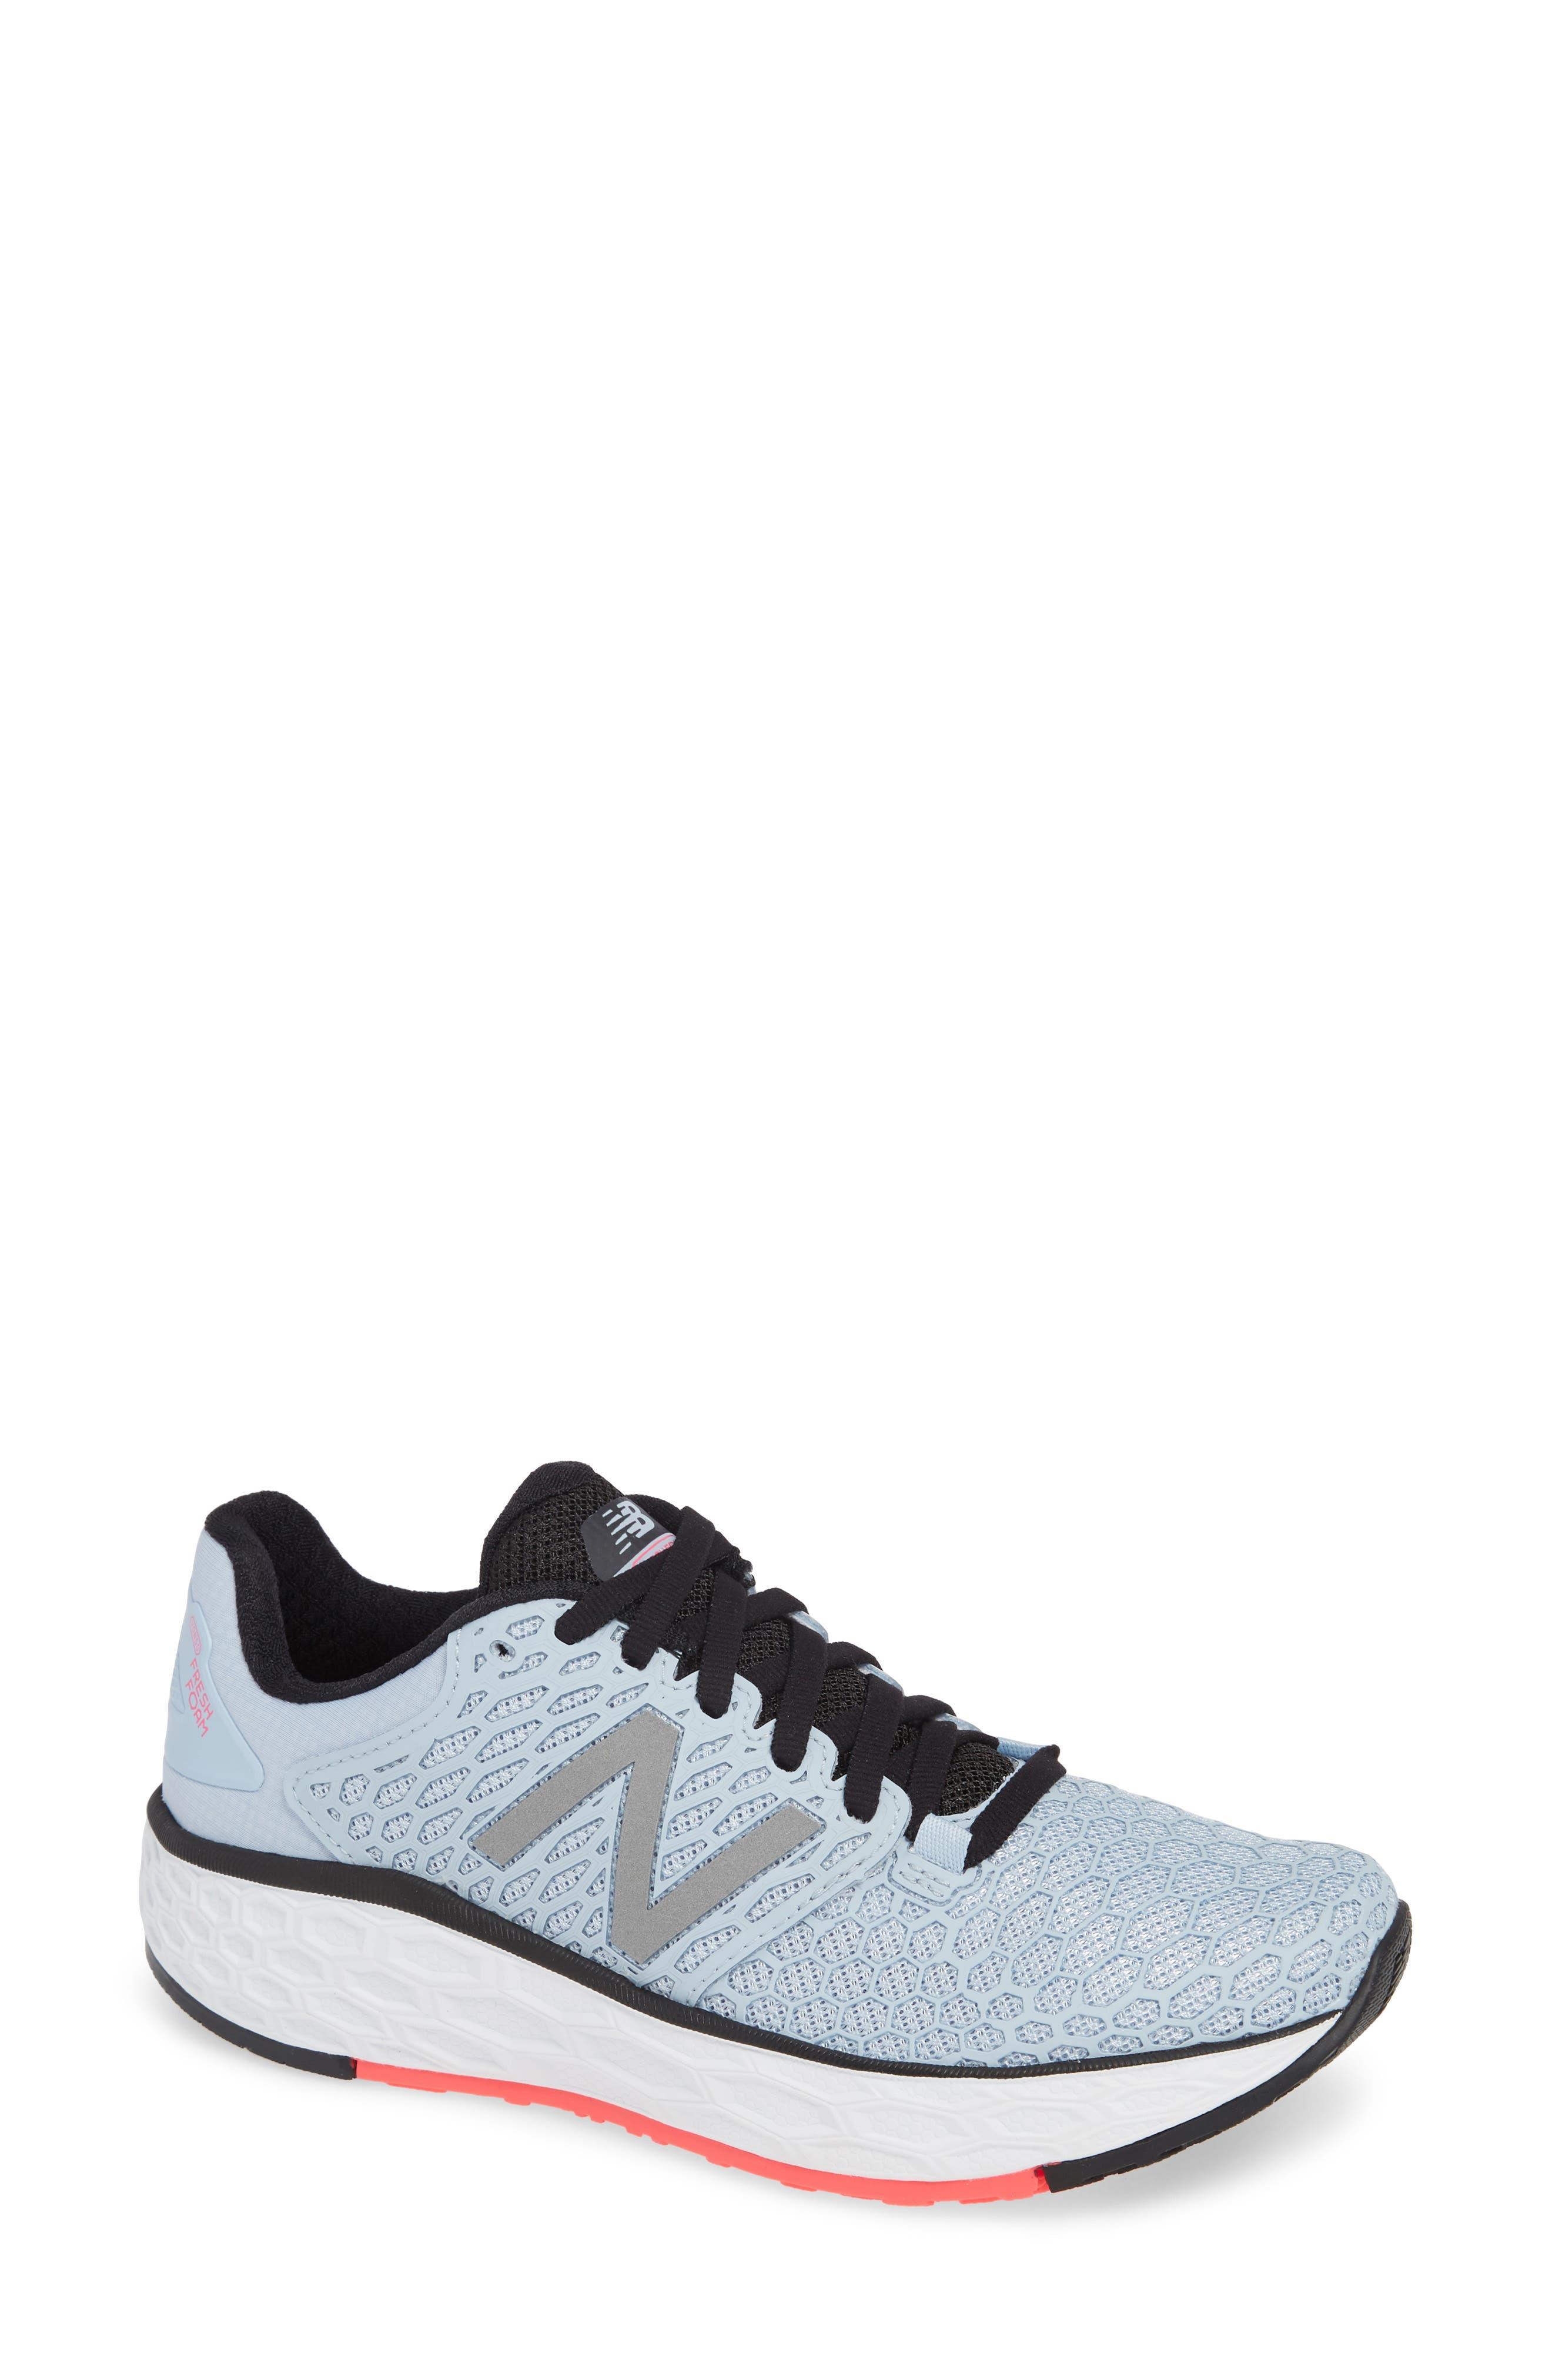 Fresh Foam Vongo Running Shoe, Main, color, ICE BLUE